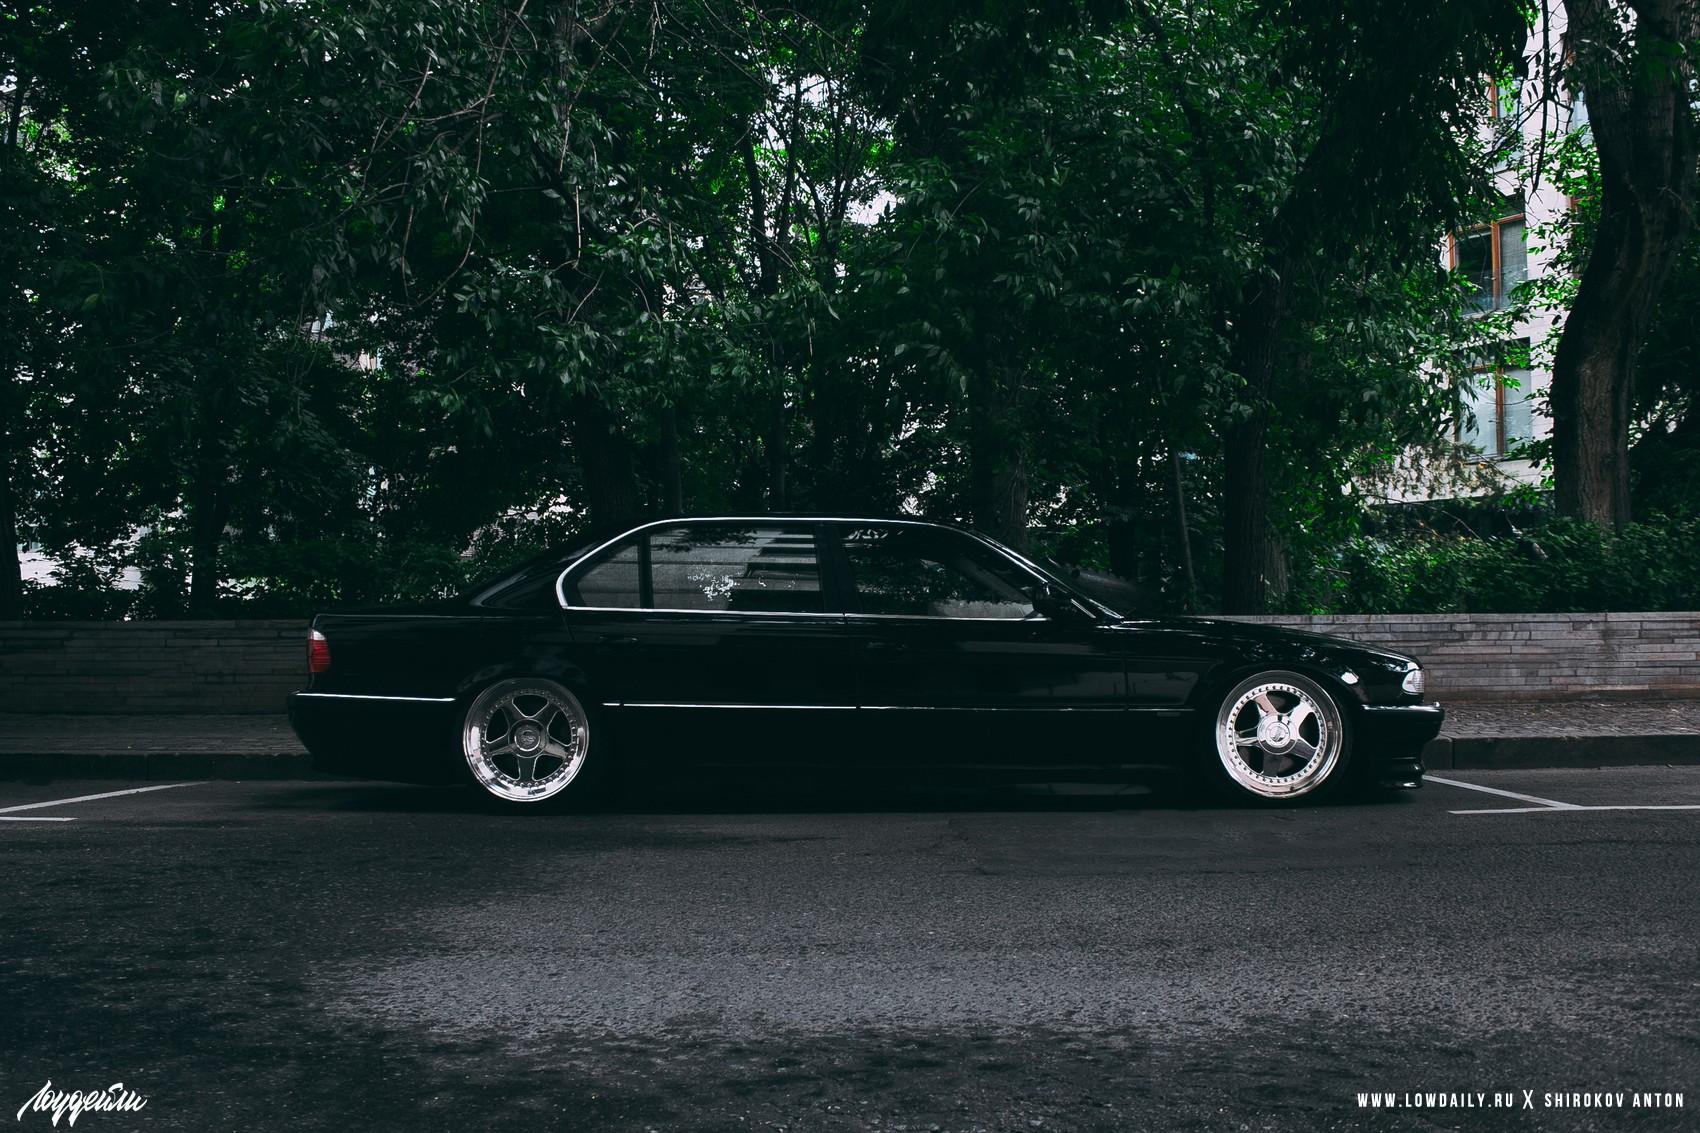 BMW E38 Lowdaily _MG_7097